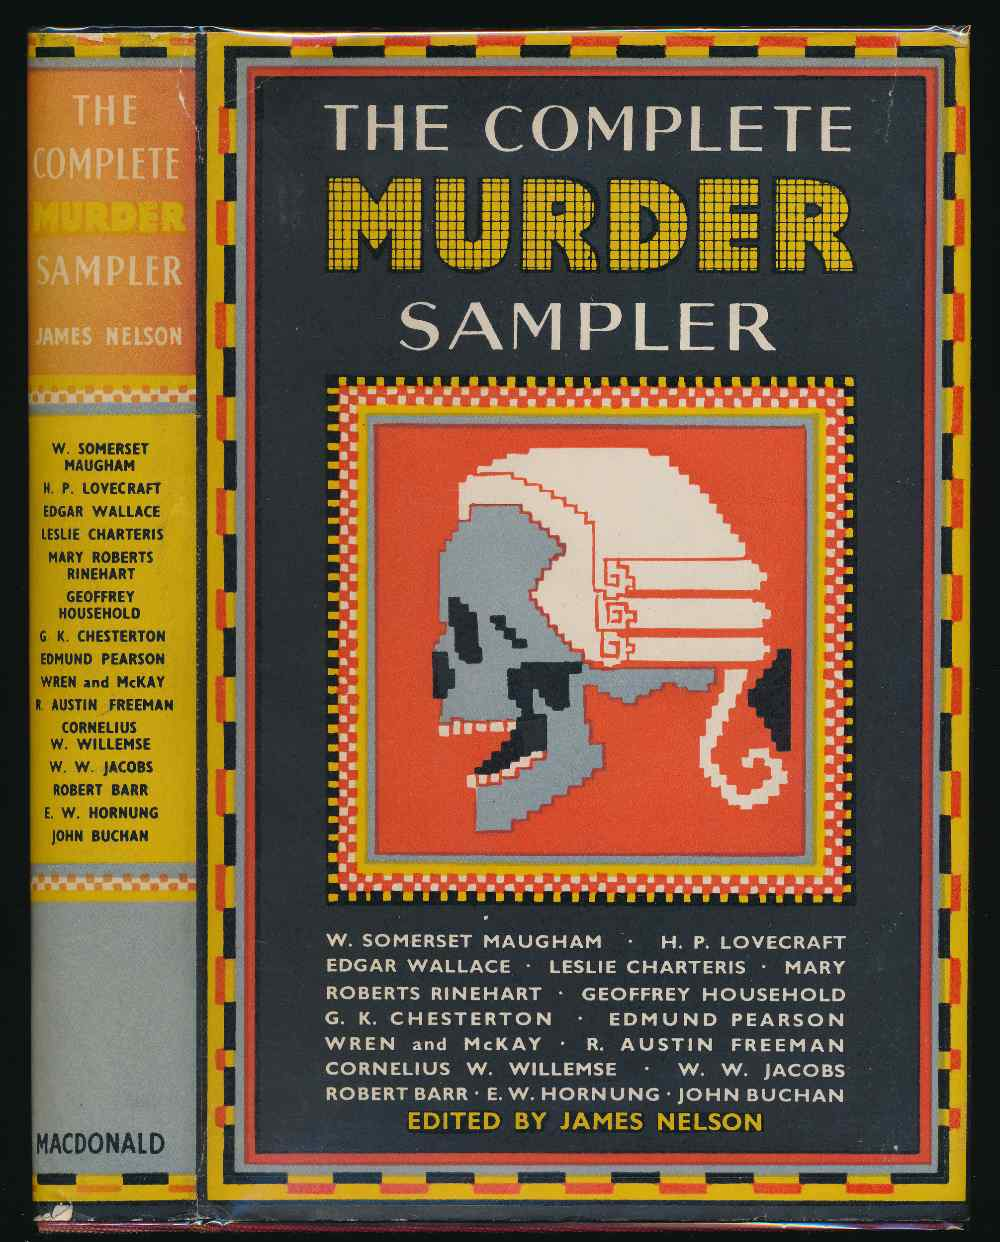 The complete murder sampler